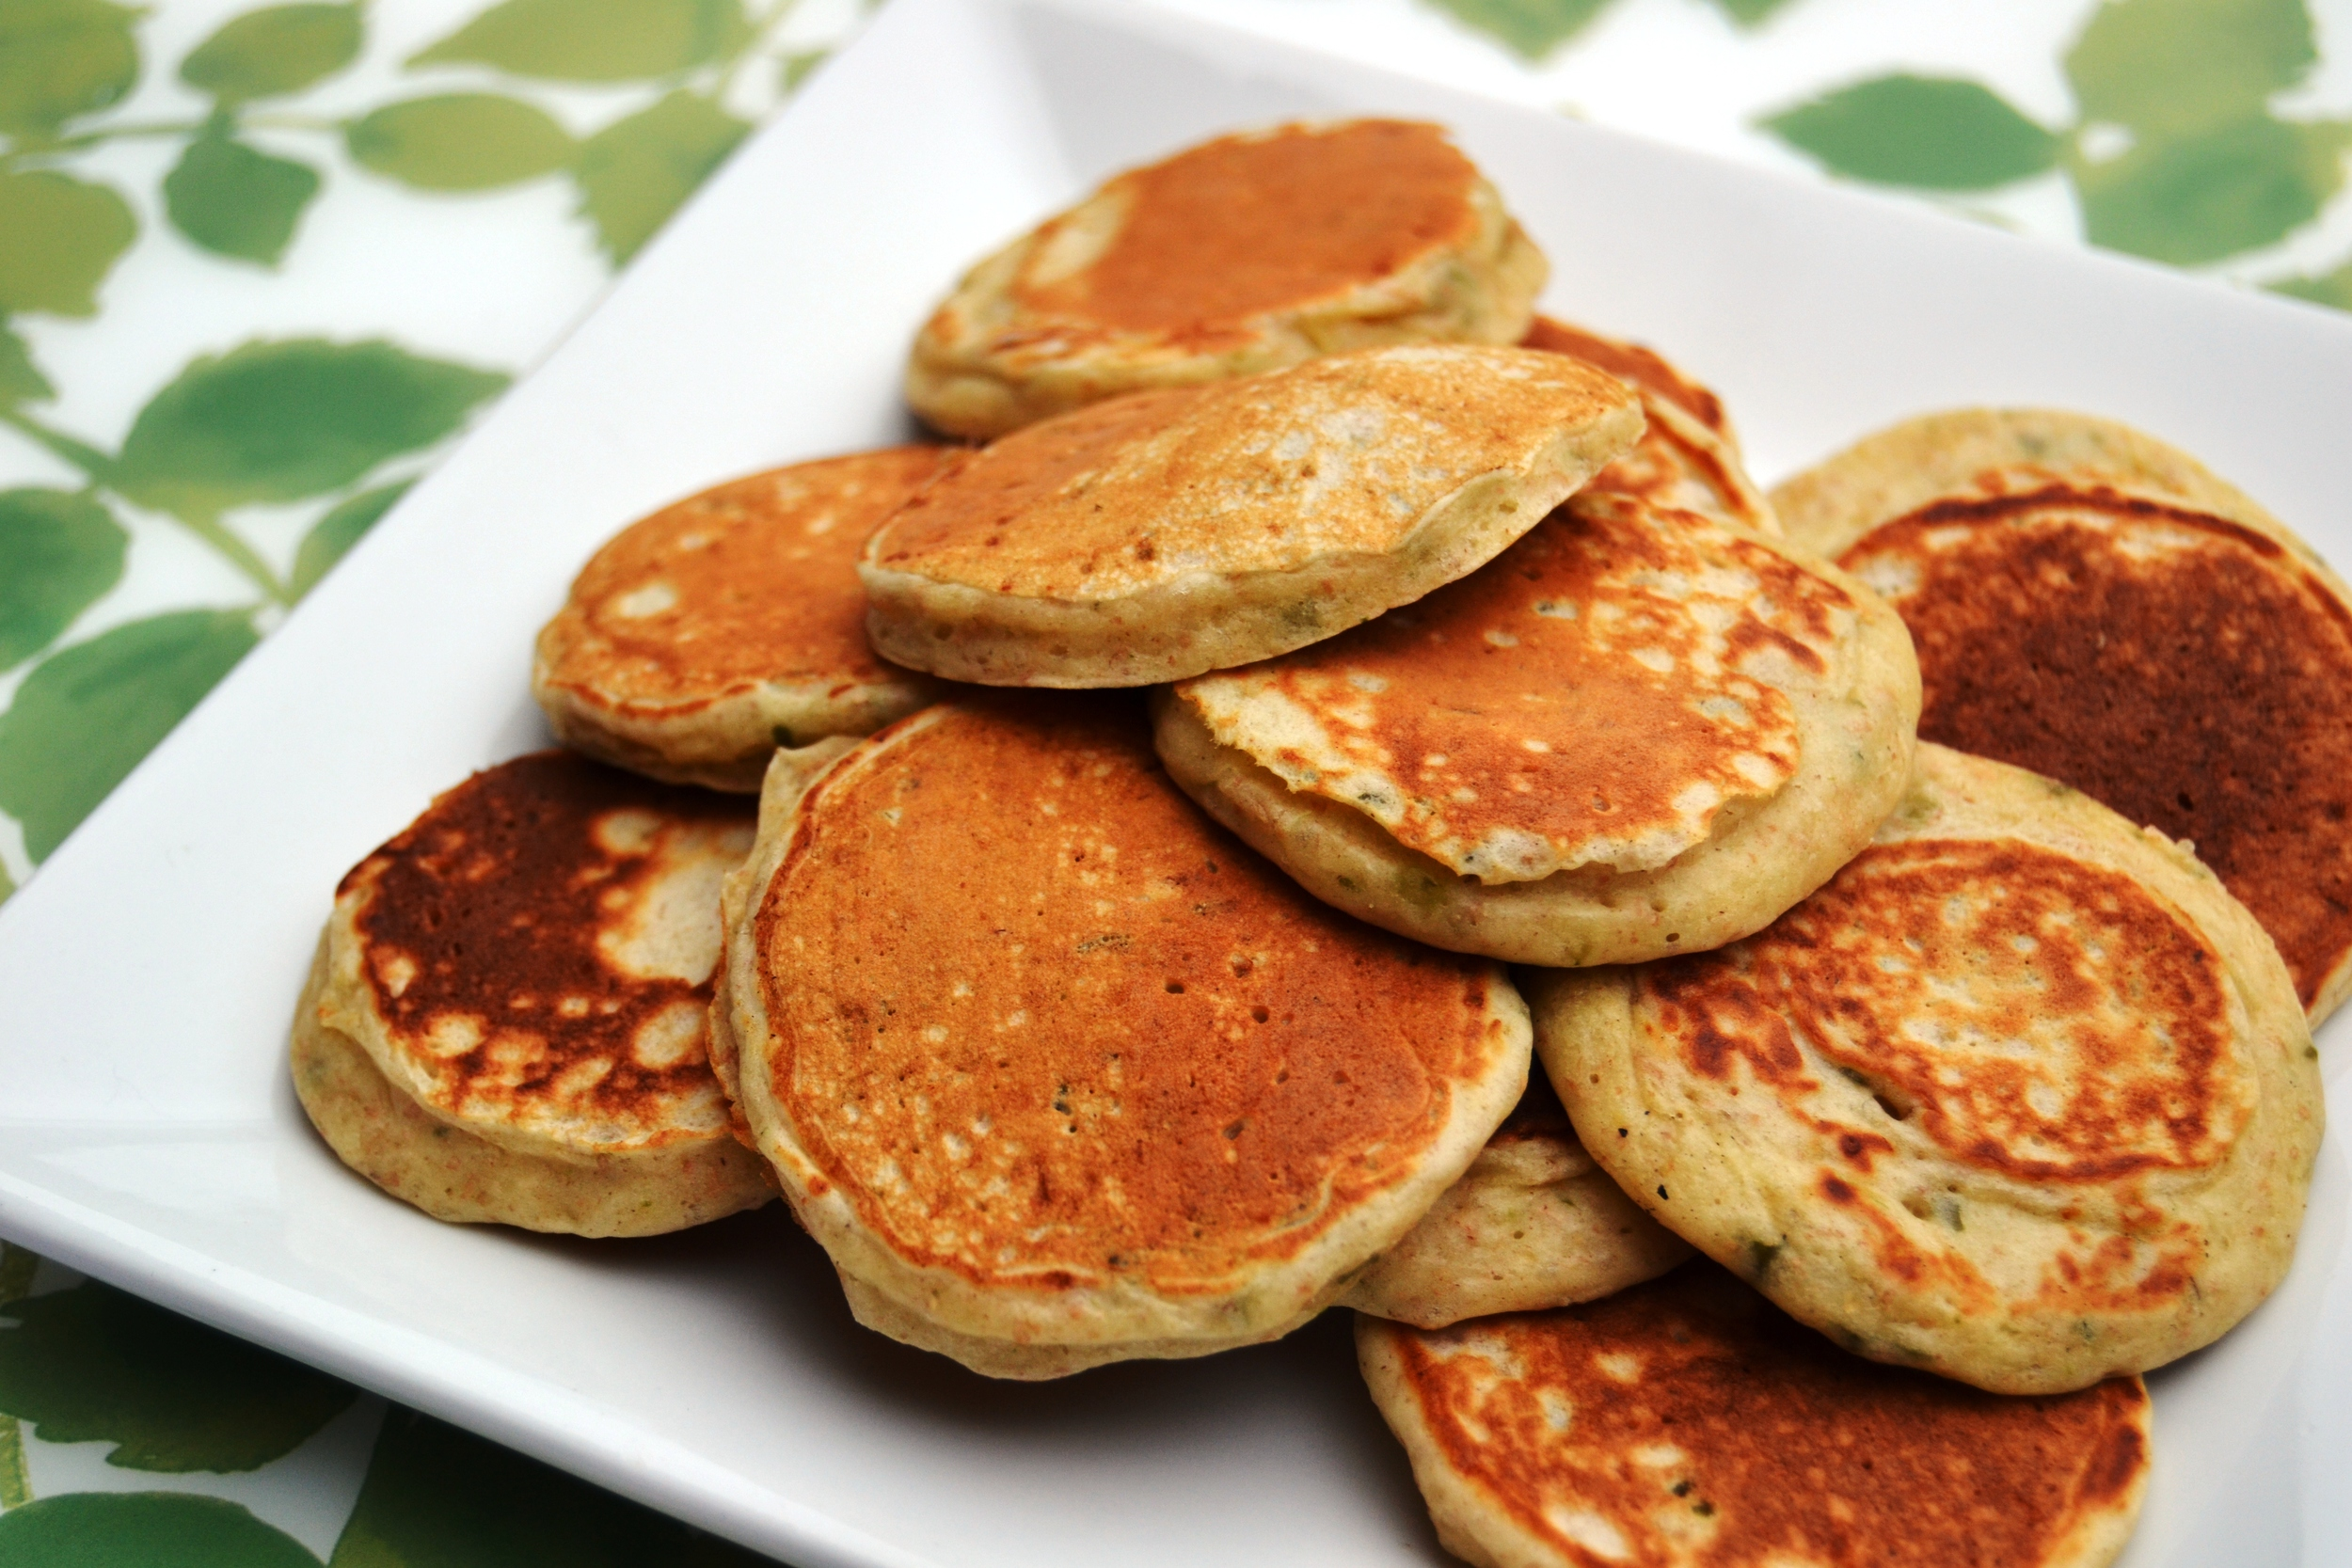 Basil & Cheese Pancakes